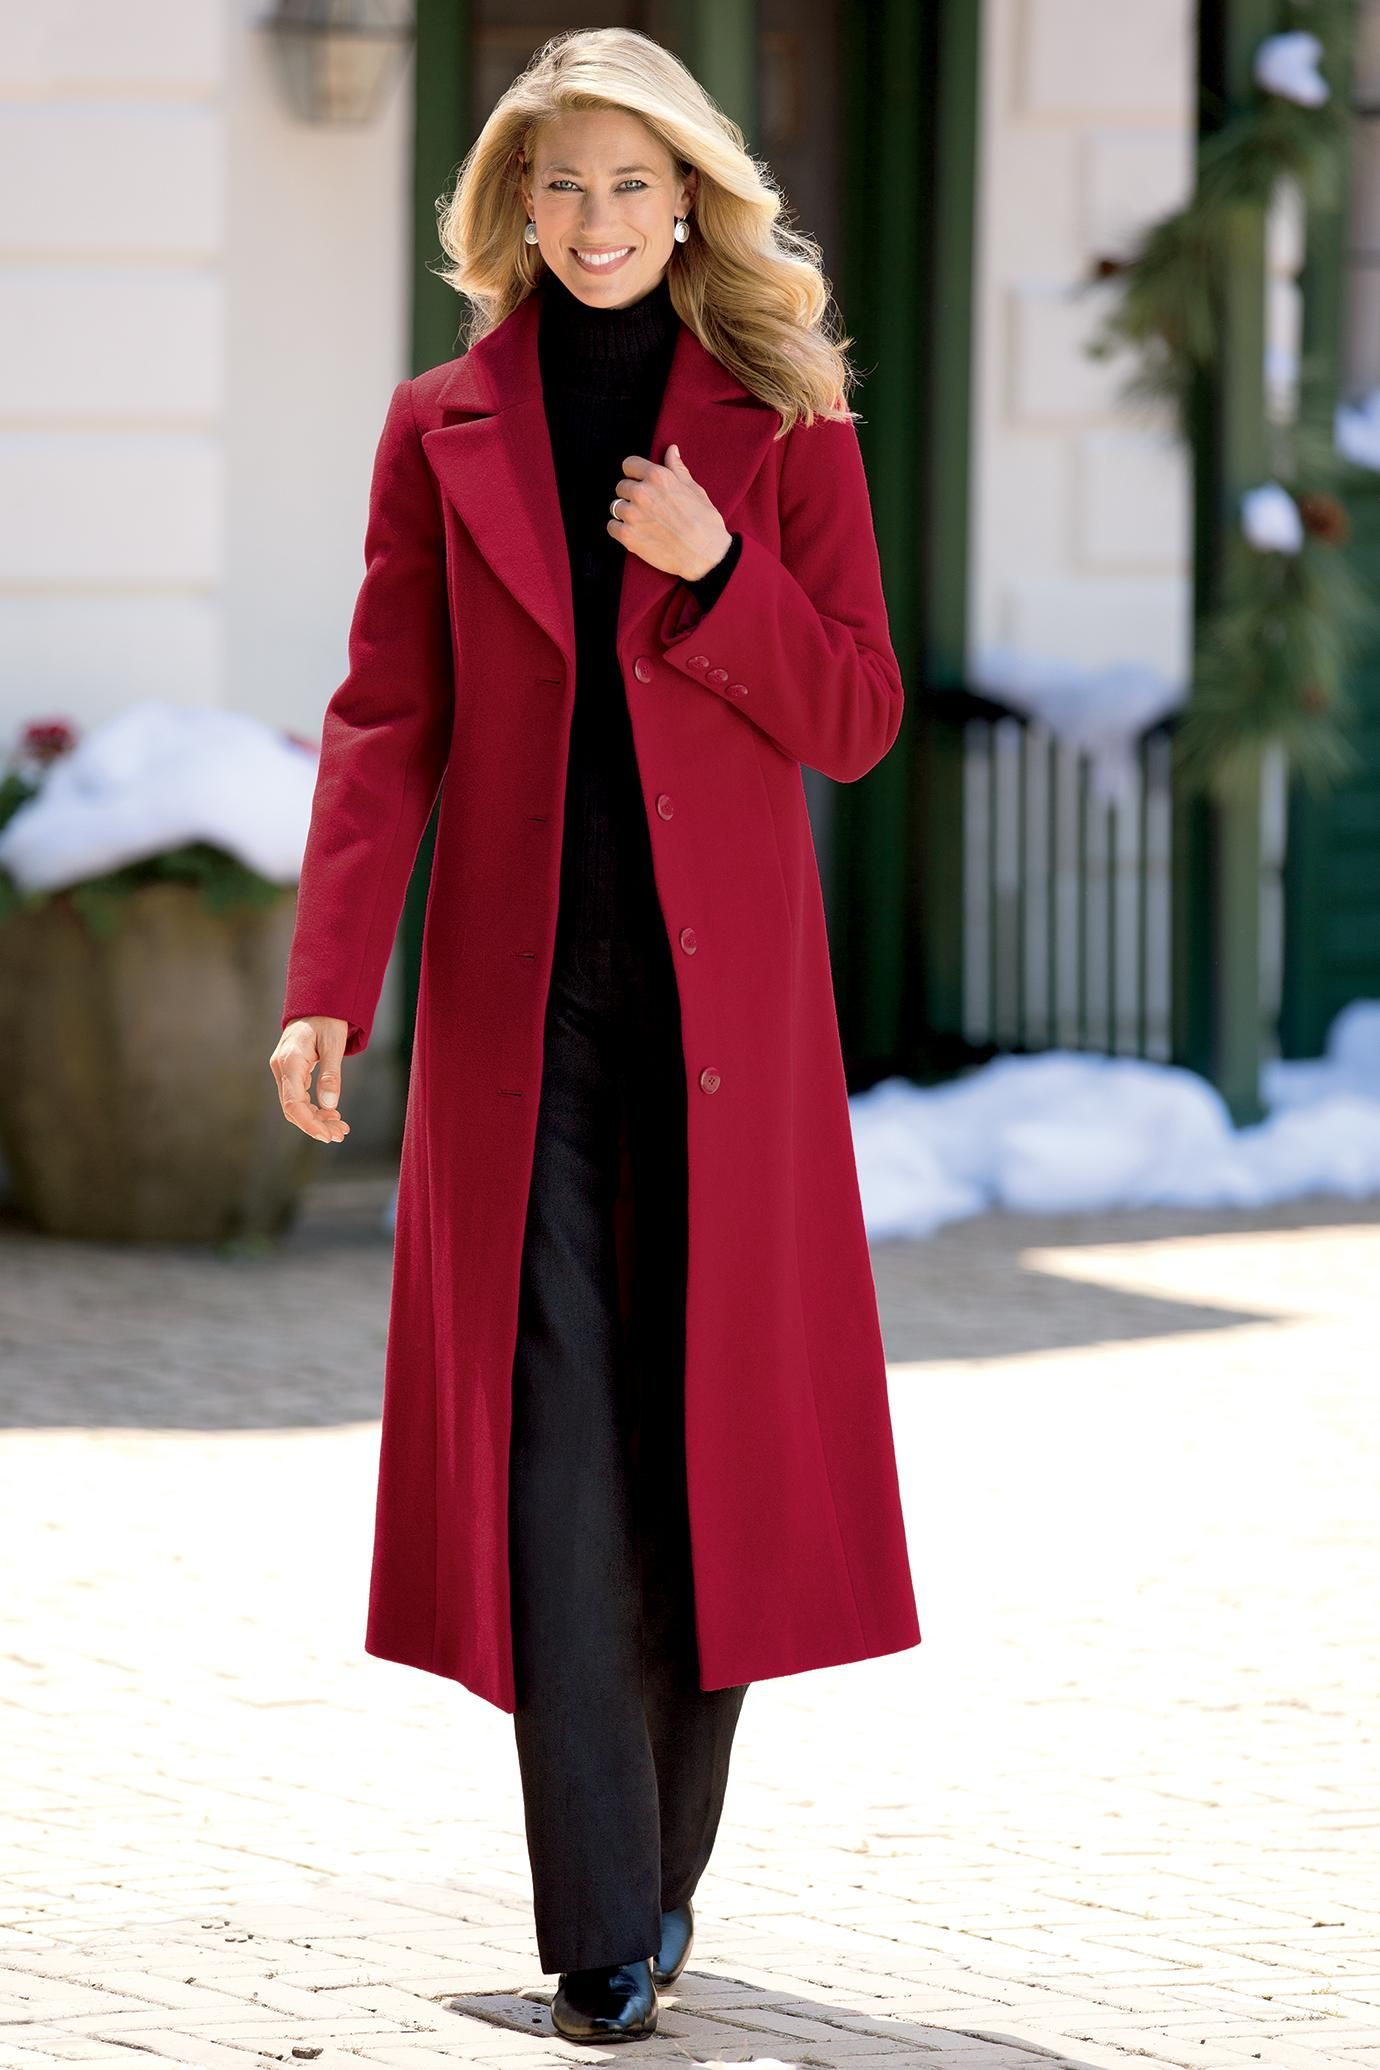 Classic Long Wool Coat - Petite Sizes - Chadwicks of ...